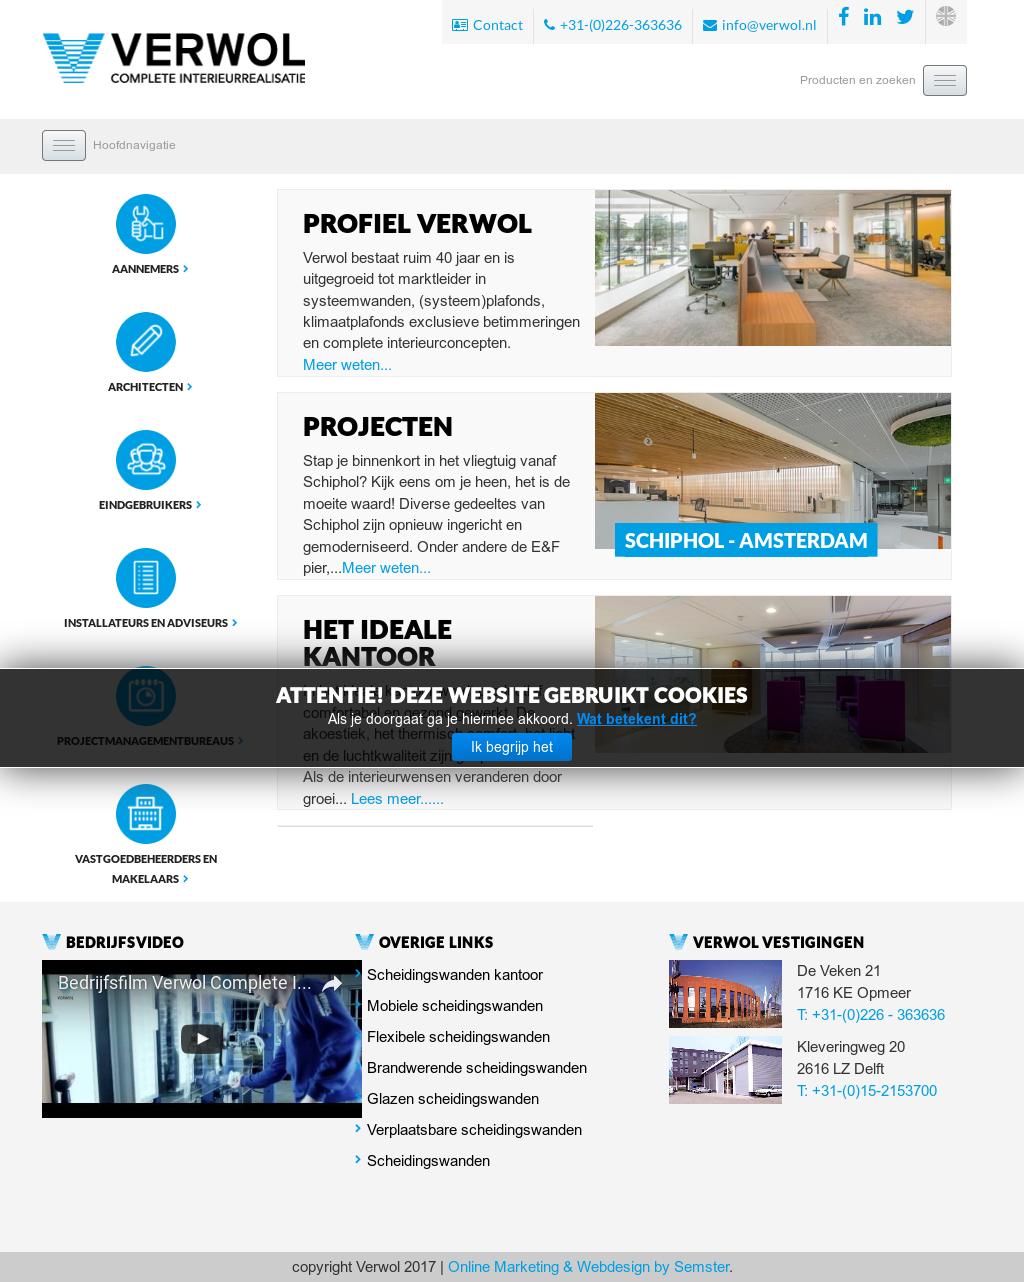 Verwol Complete Interieur Realisatie Competitors, Revenue and ...